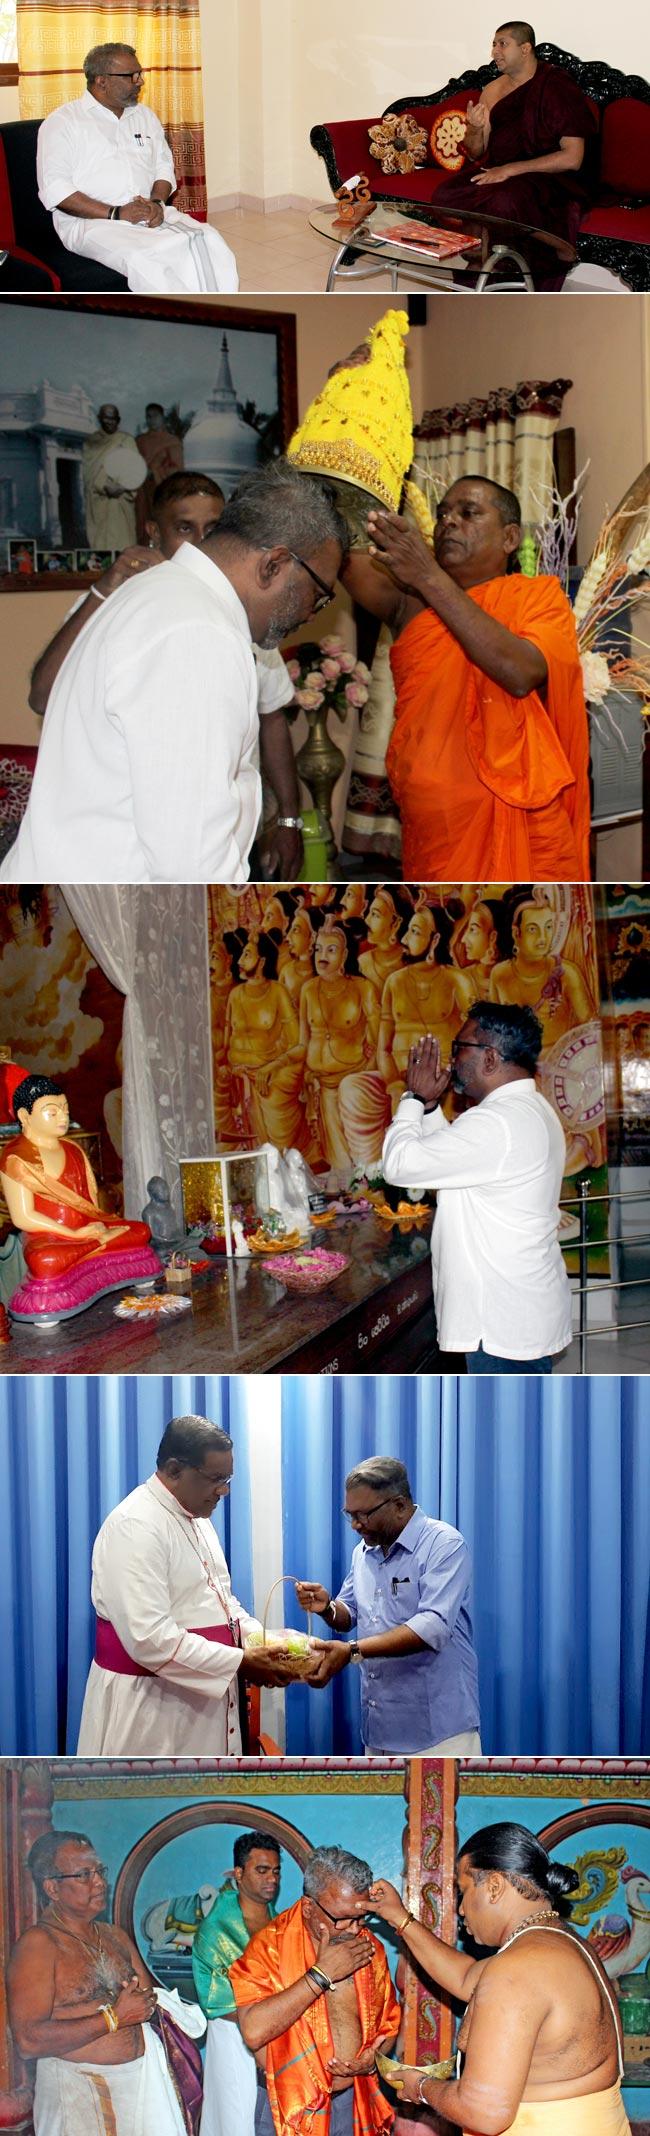 Suren Ragawan is President's best decision – Meegahajandure Wimala Thero